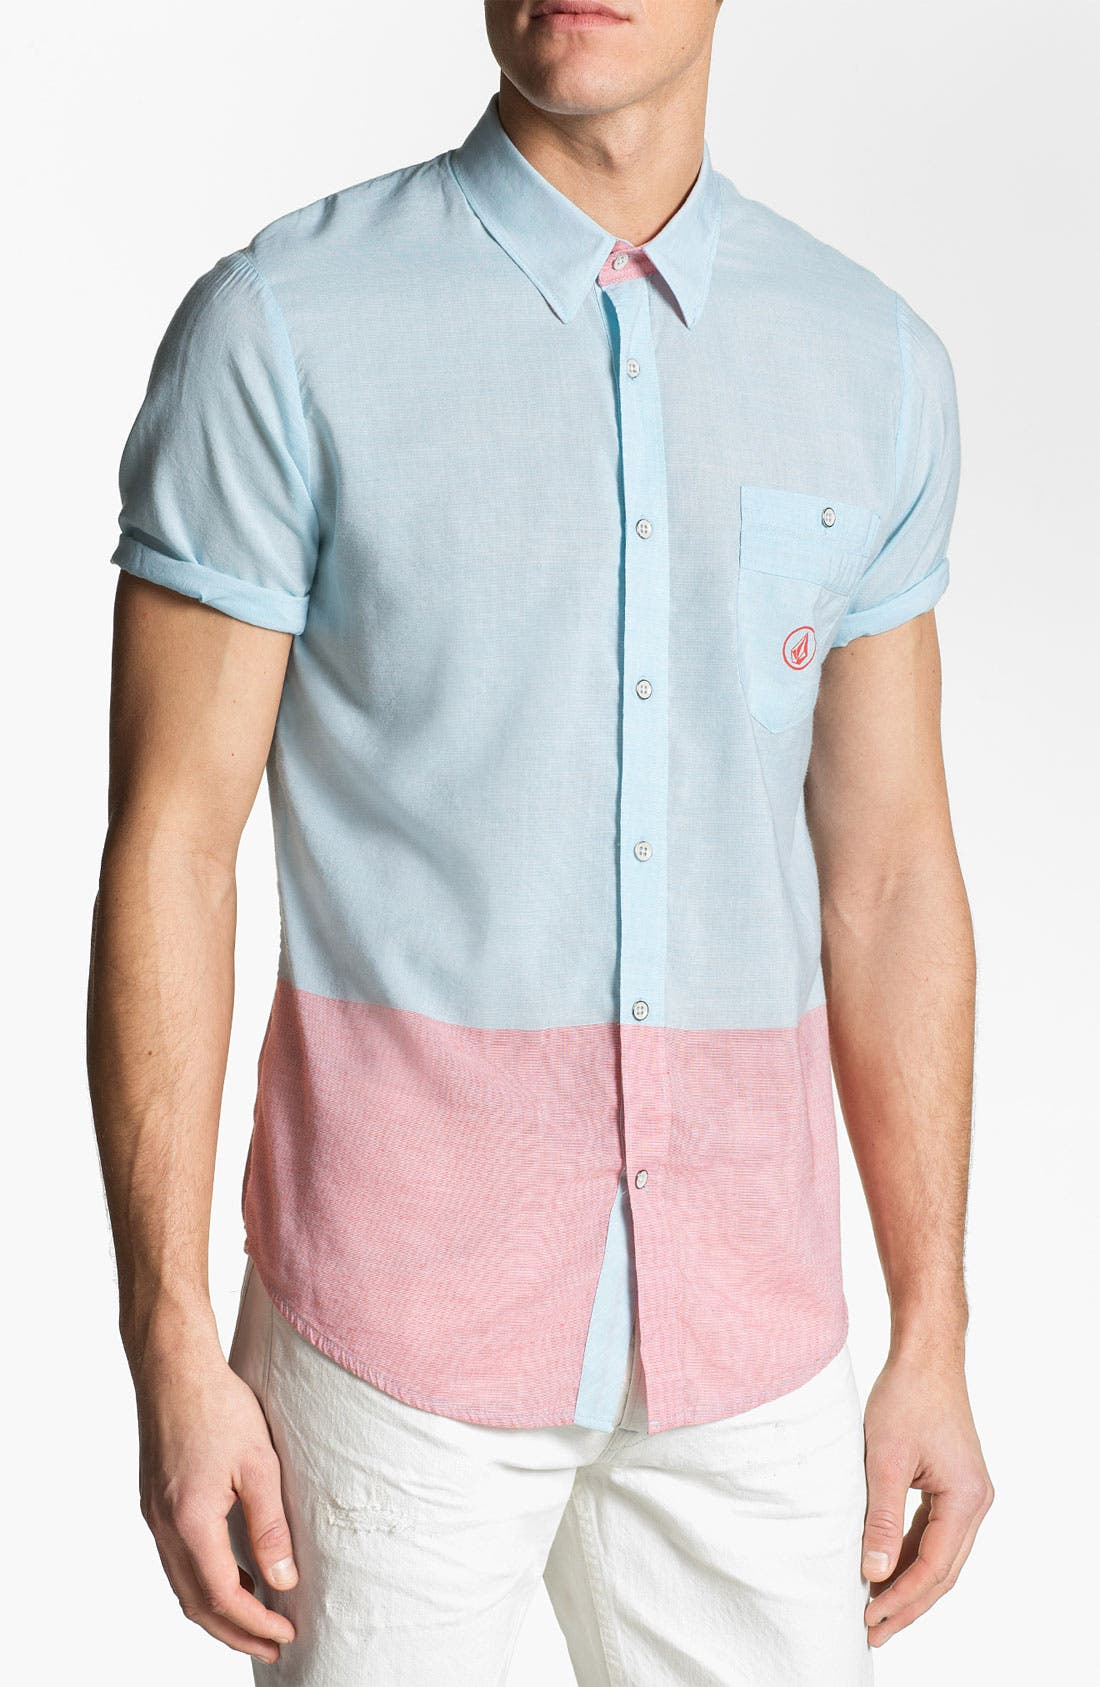 Alternate Image 1 Selected - Volcom 'Bank Lock' Short Sleeve Woven Shirt